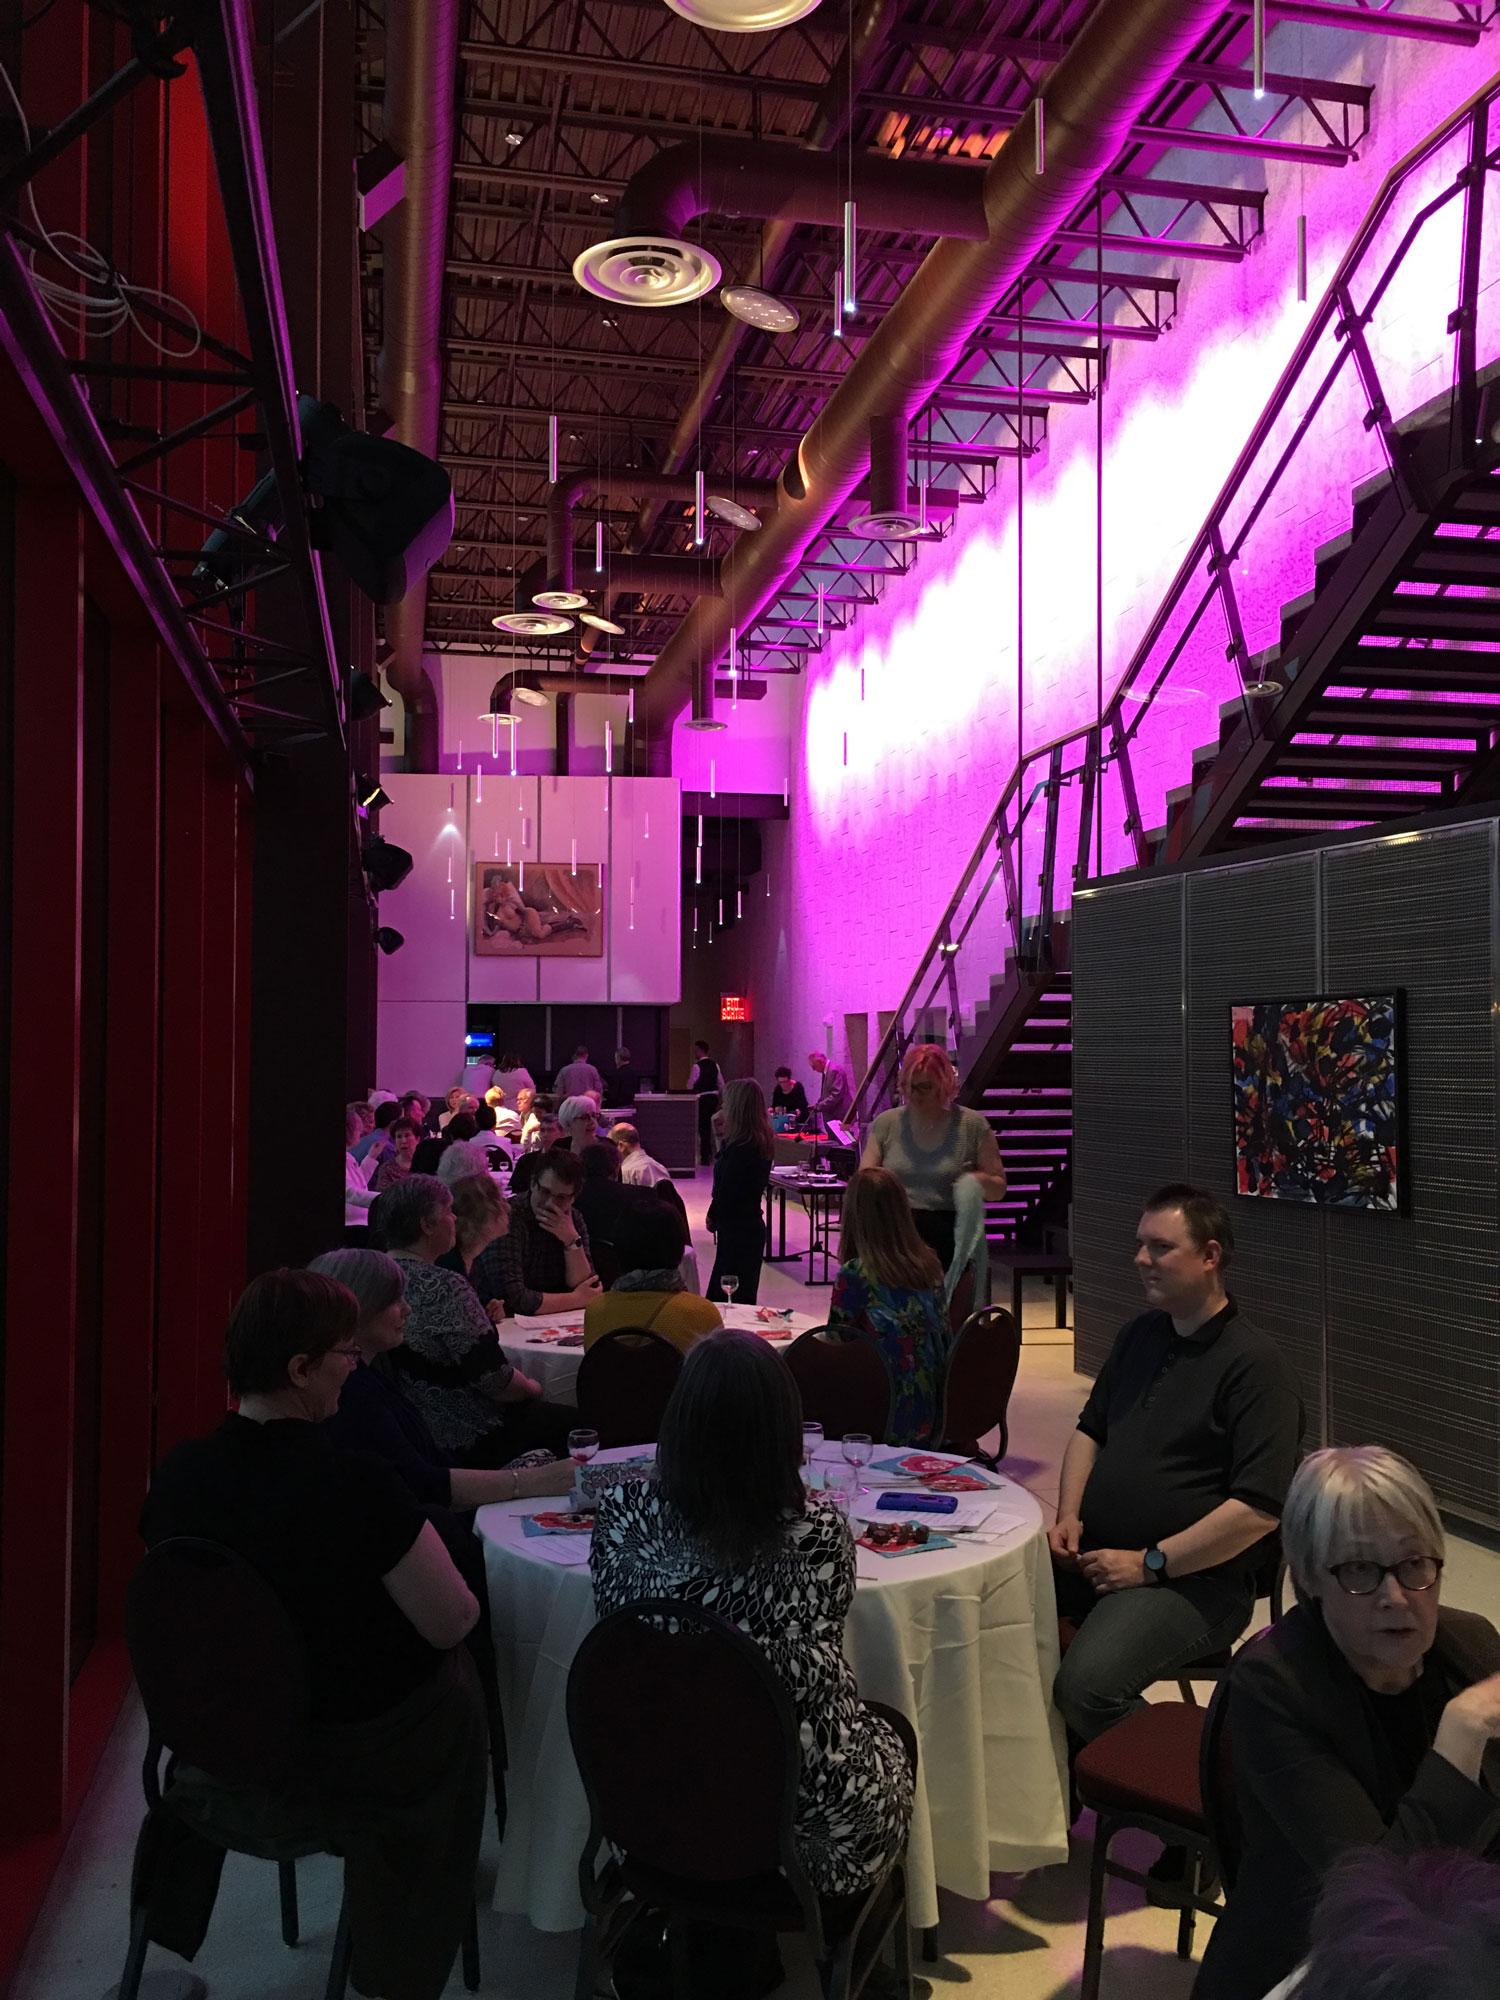 winnipeg-singers-wine-tasting-fundraiser-2017.jpg